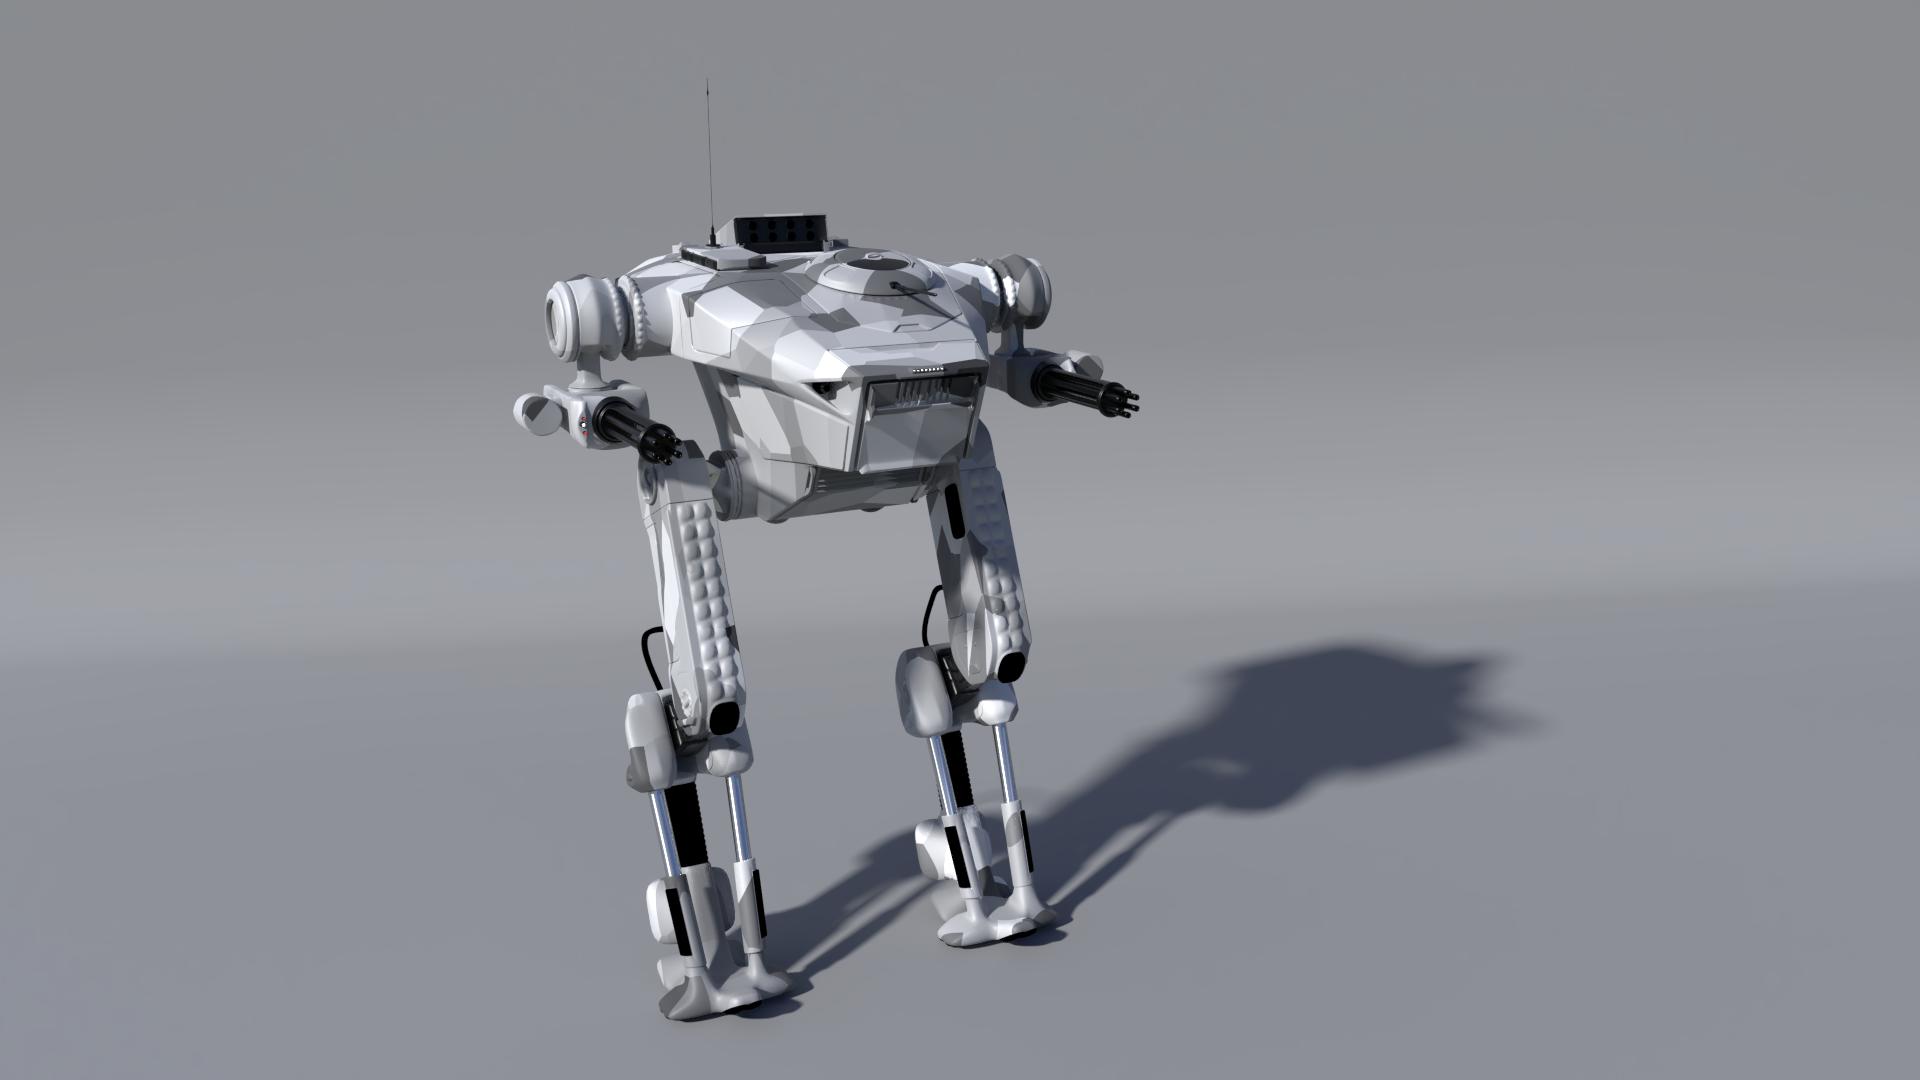 General 1920x1080 robot wireframe 3D digital art